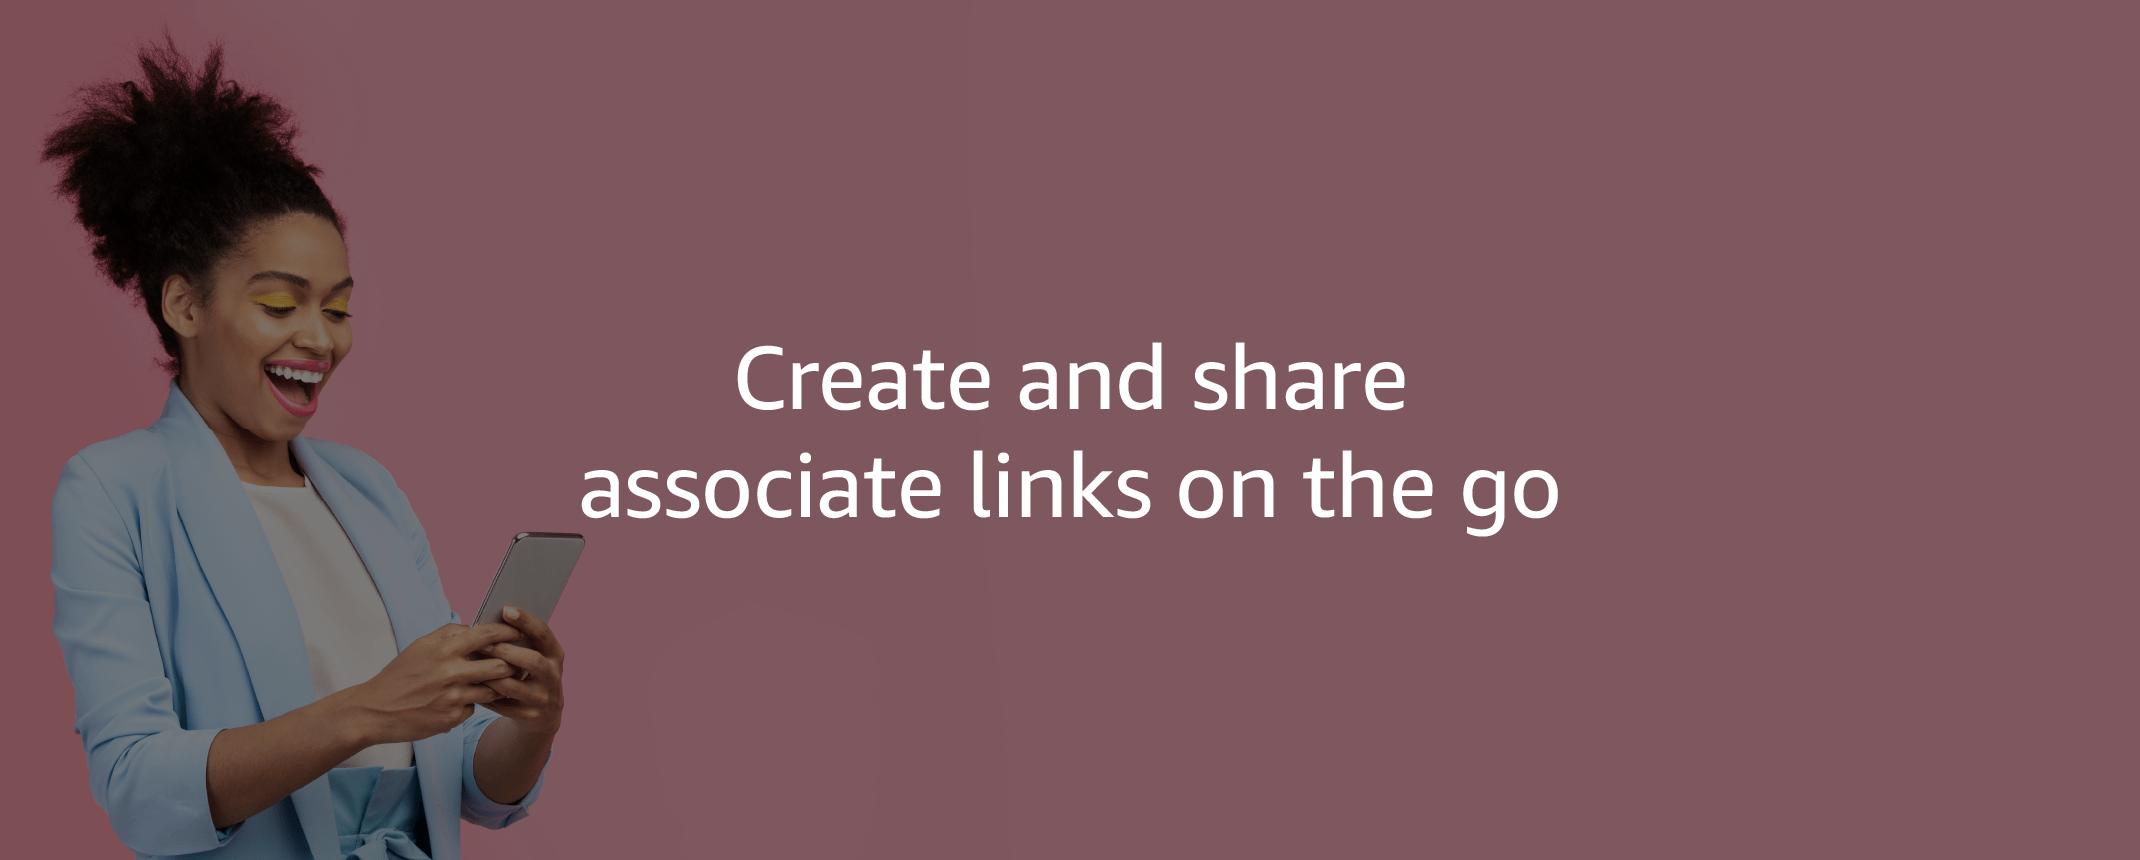 Create and share associate links on the go